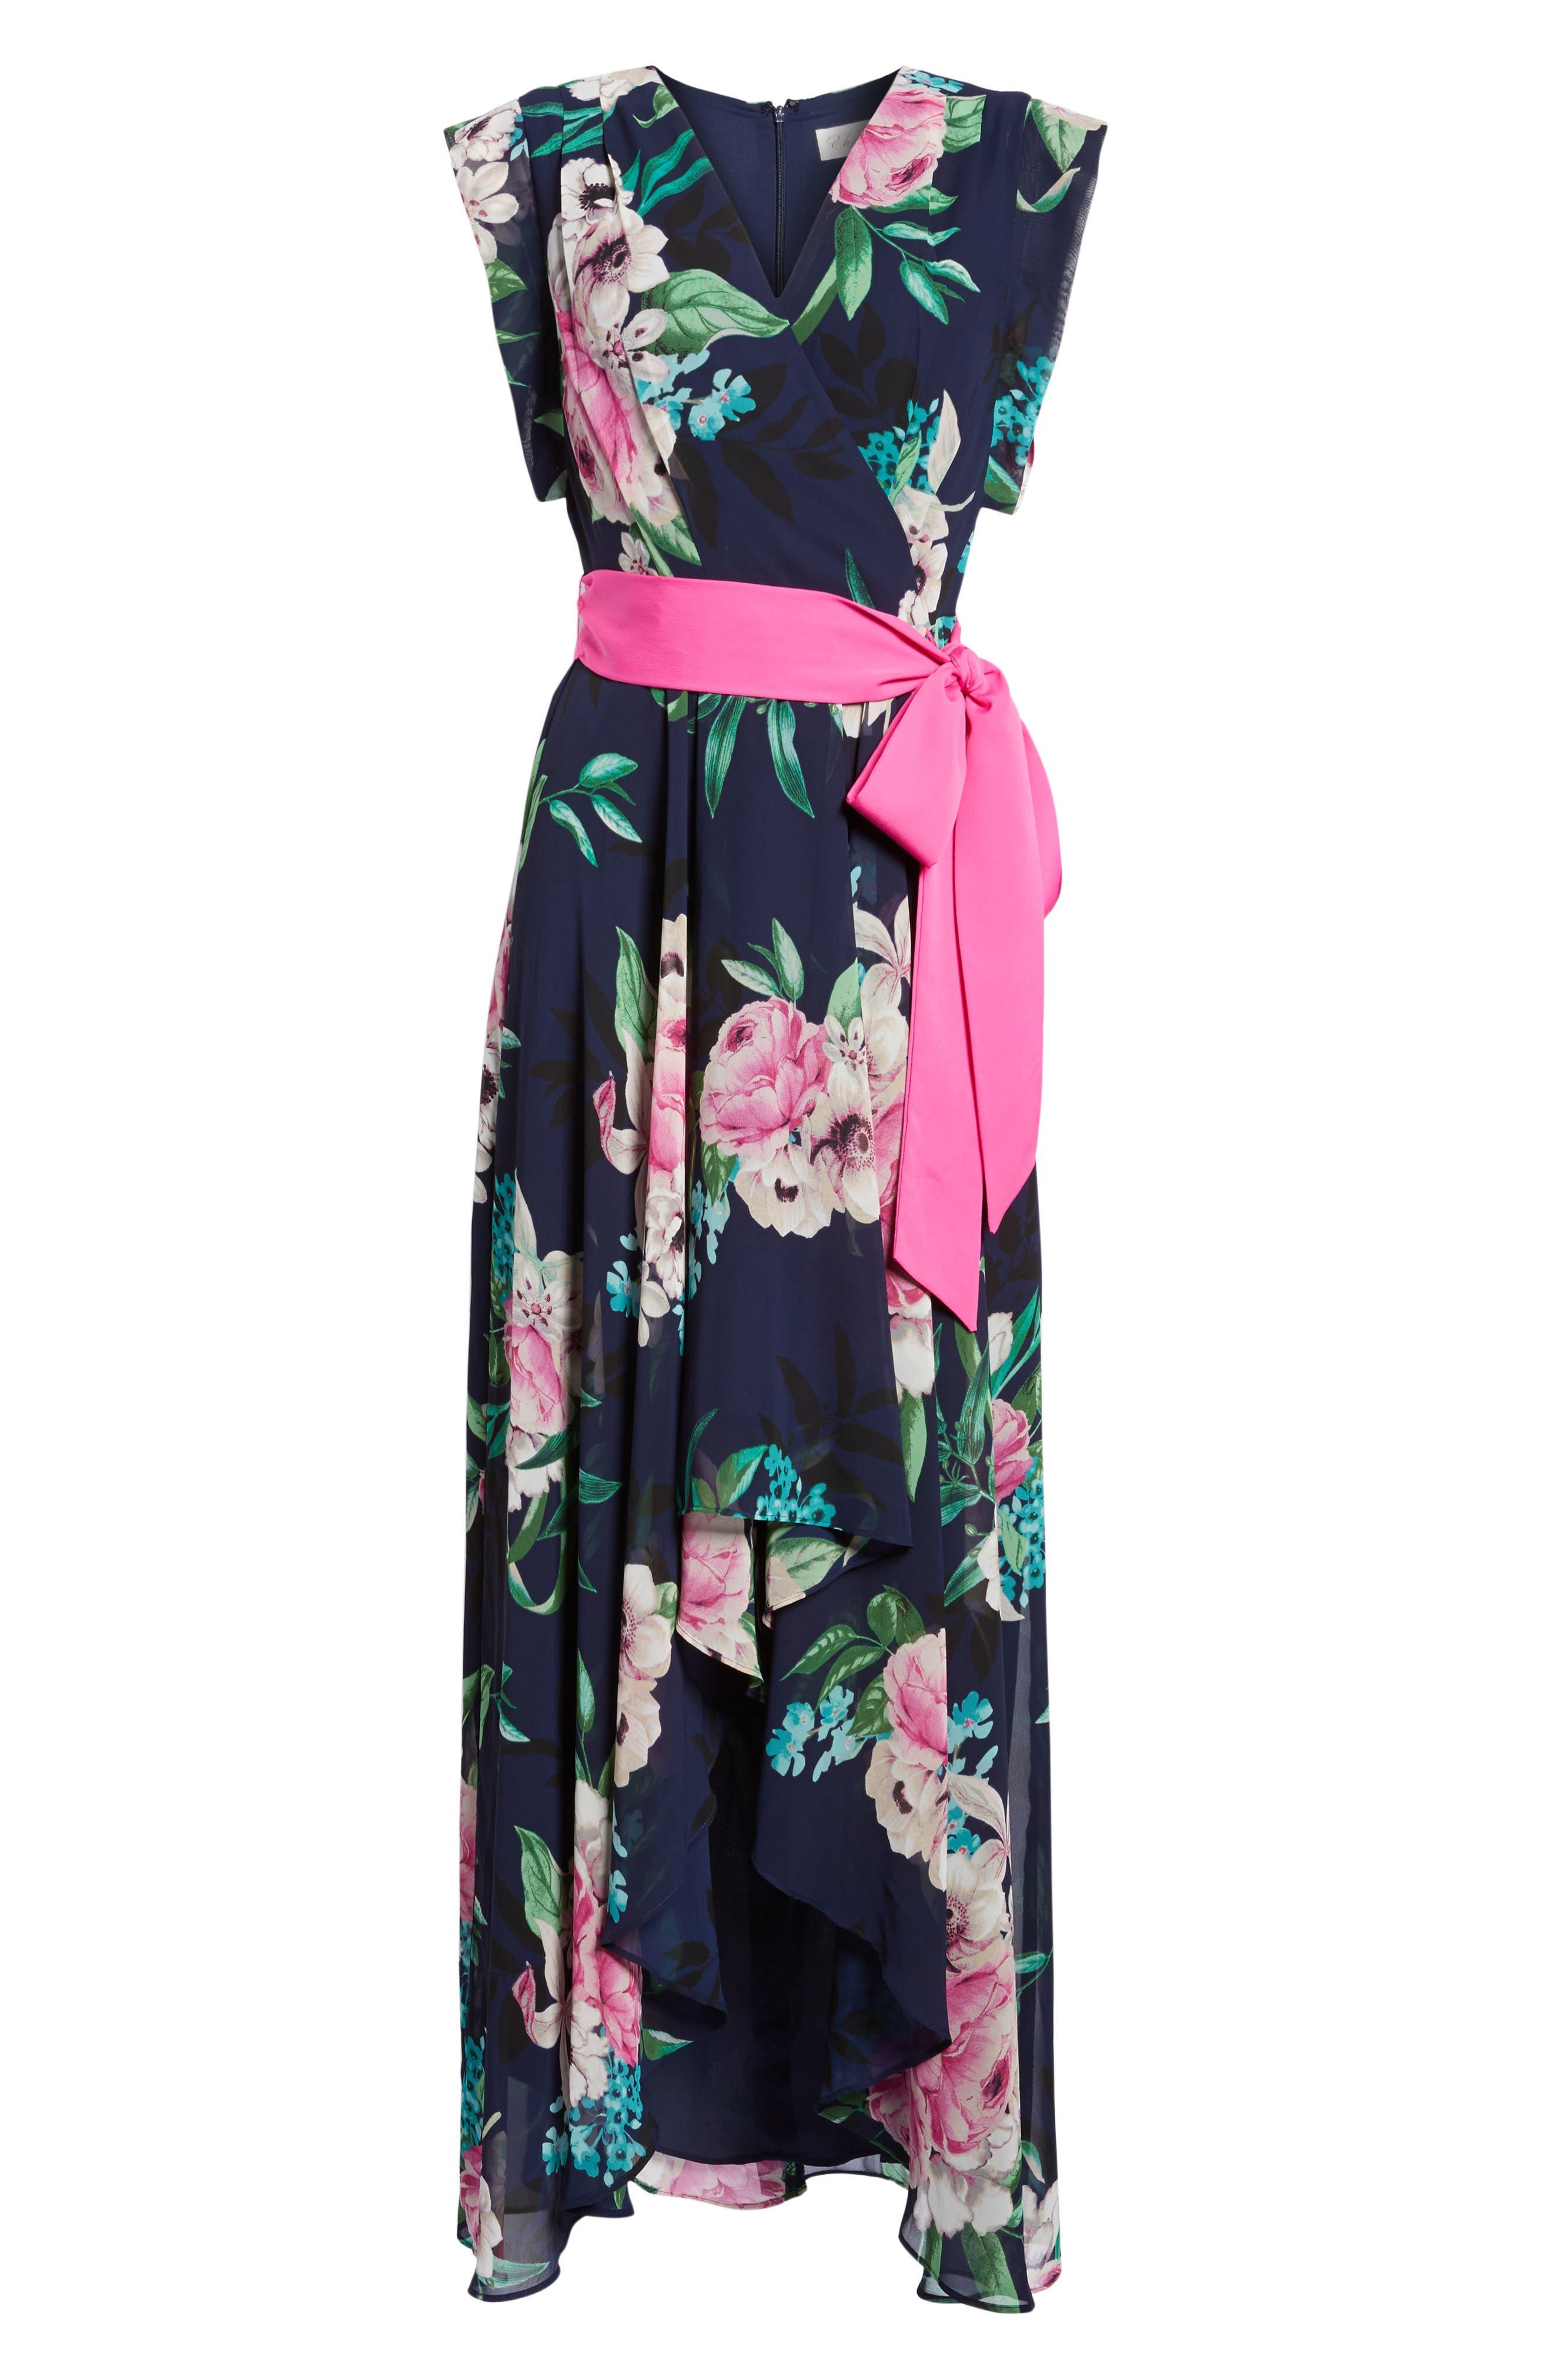 ELIZA J, Floral Print Chiffon High/Low Dress, Main thumbnail 1, color, 470